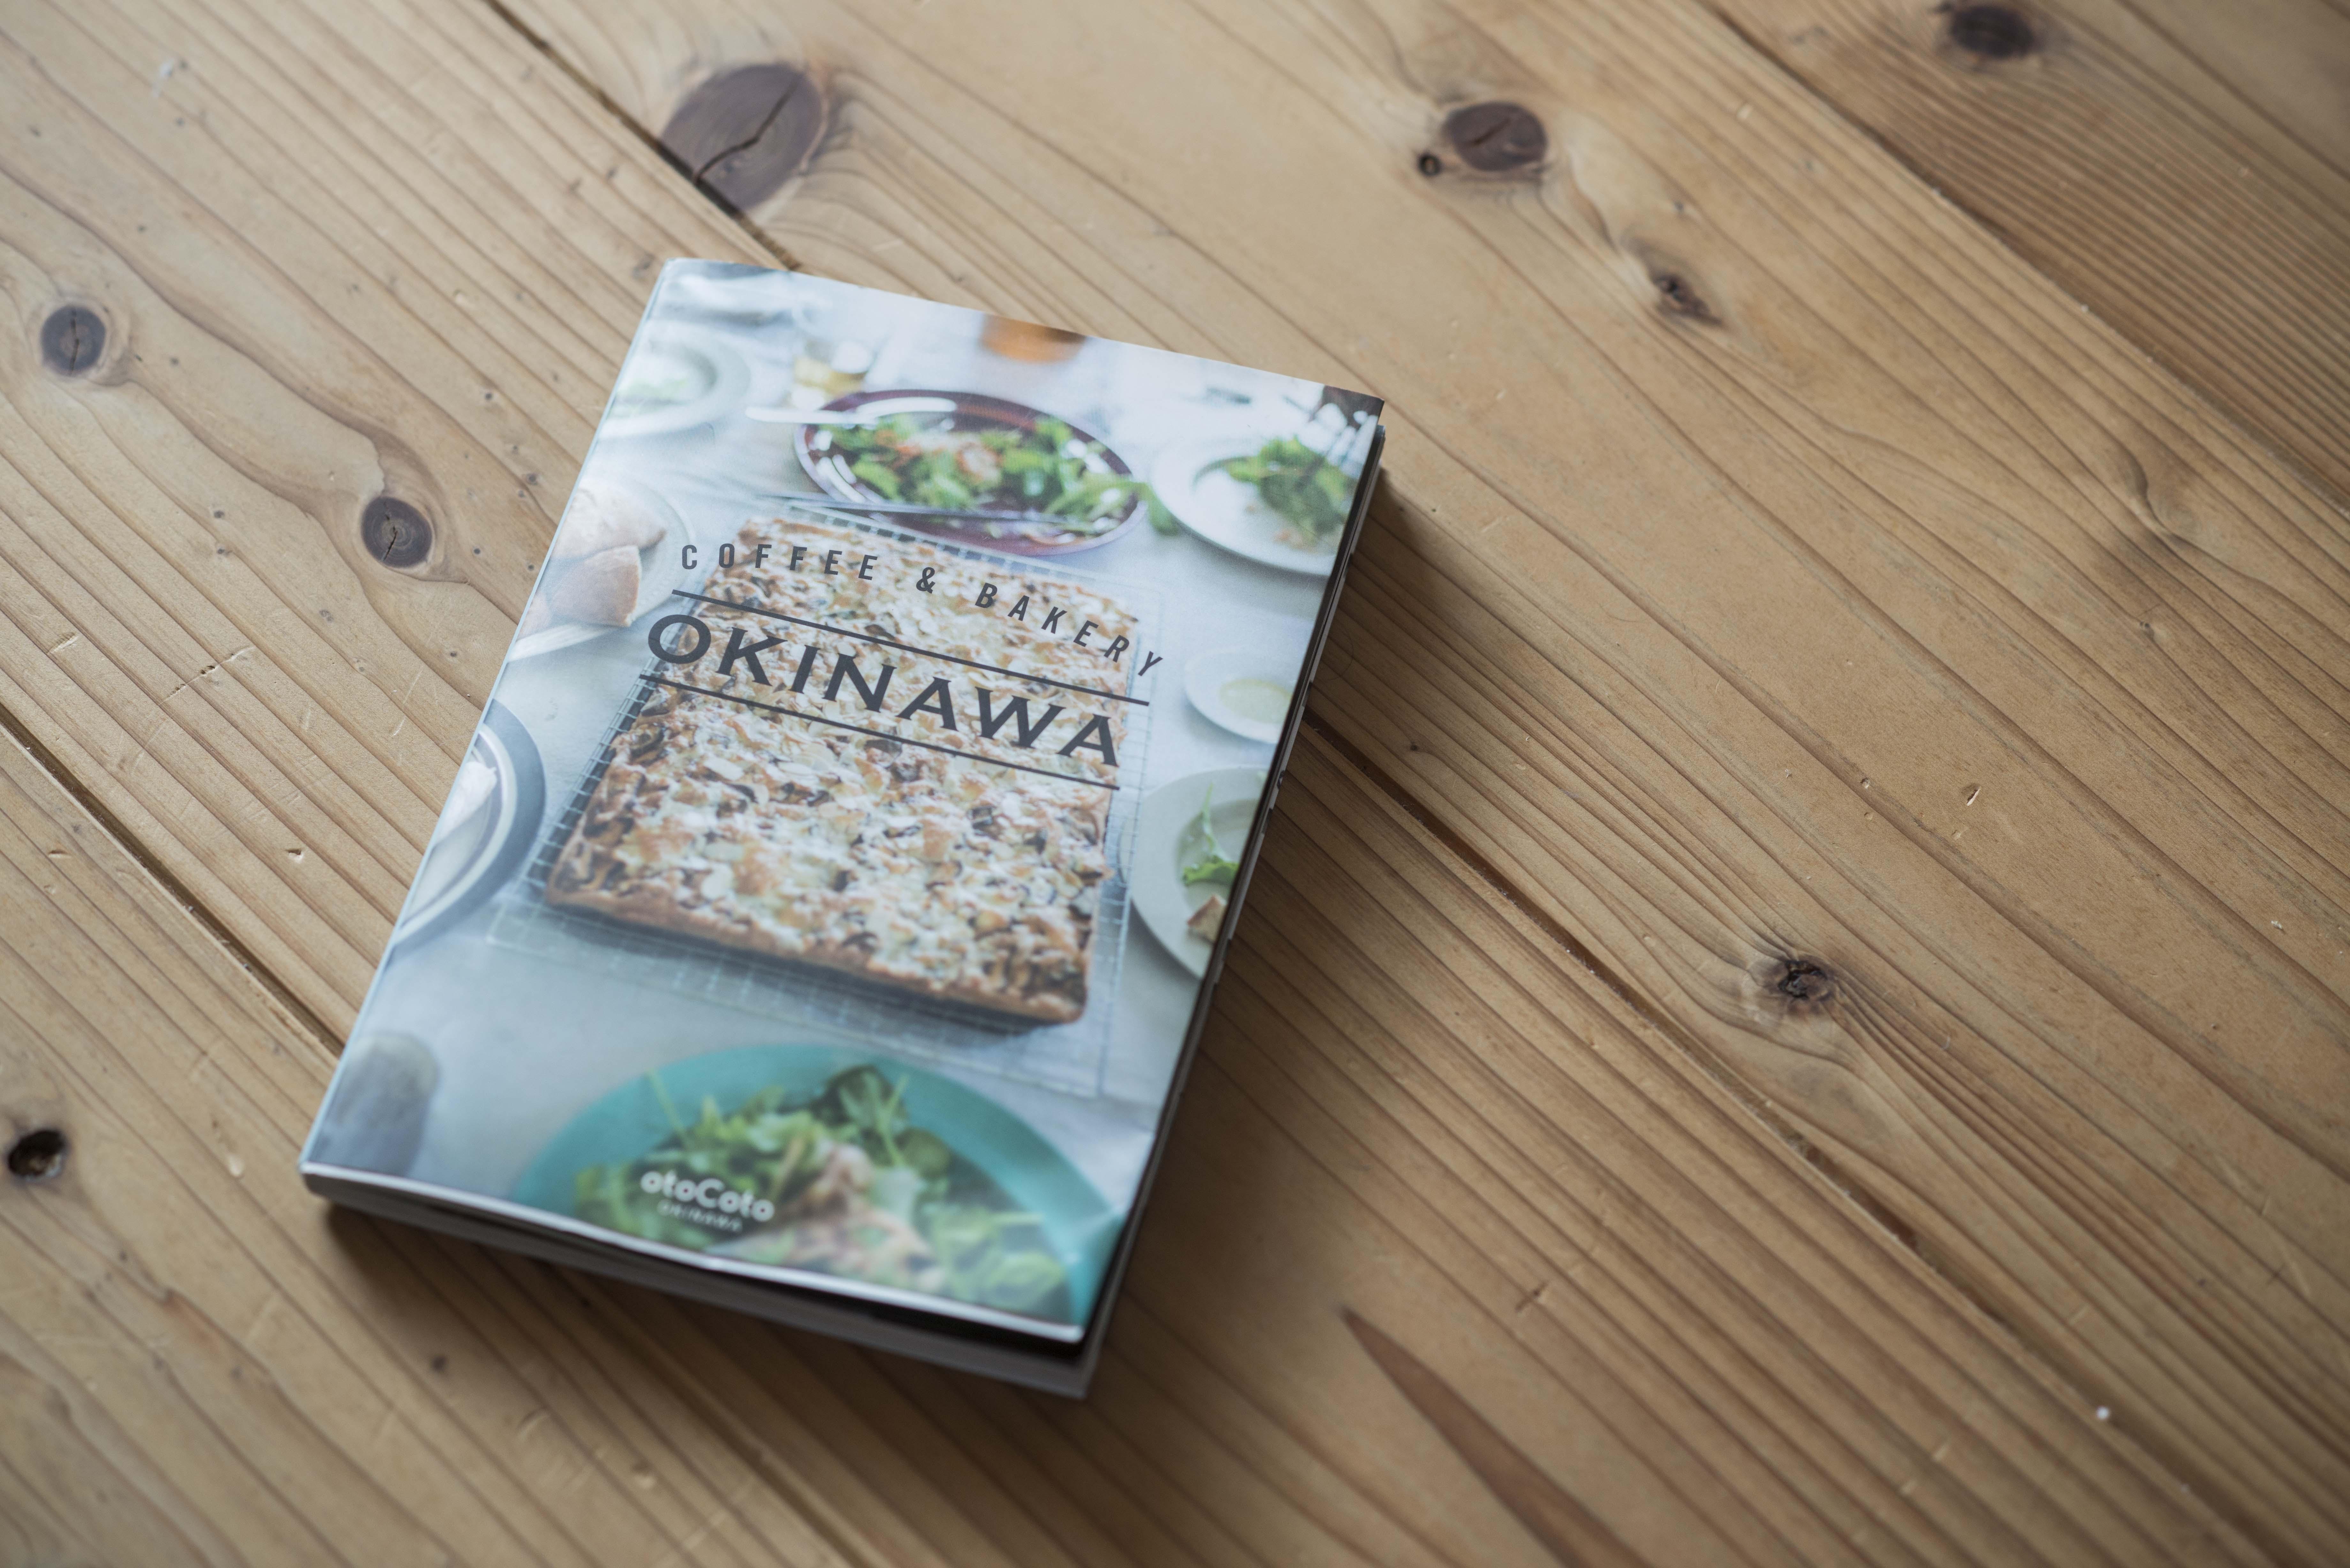 COFEE&BAKERY OKINAWA